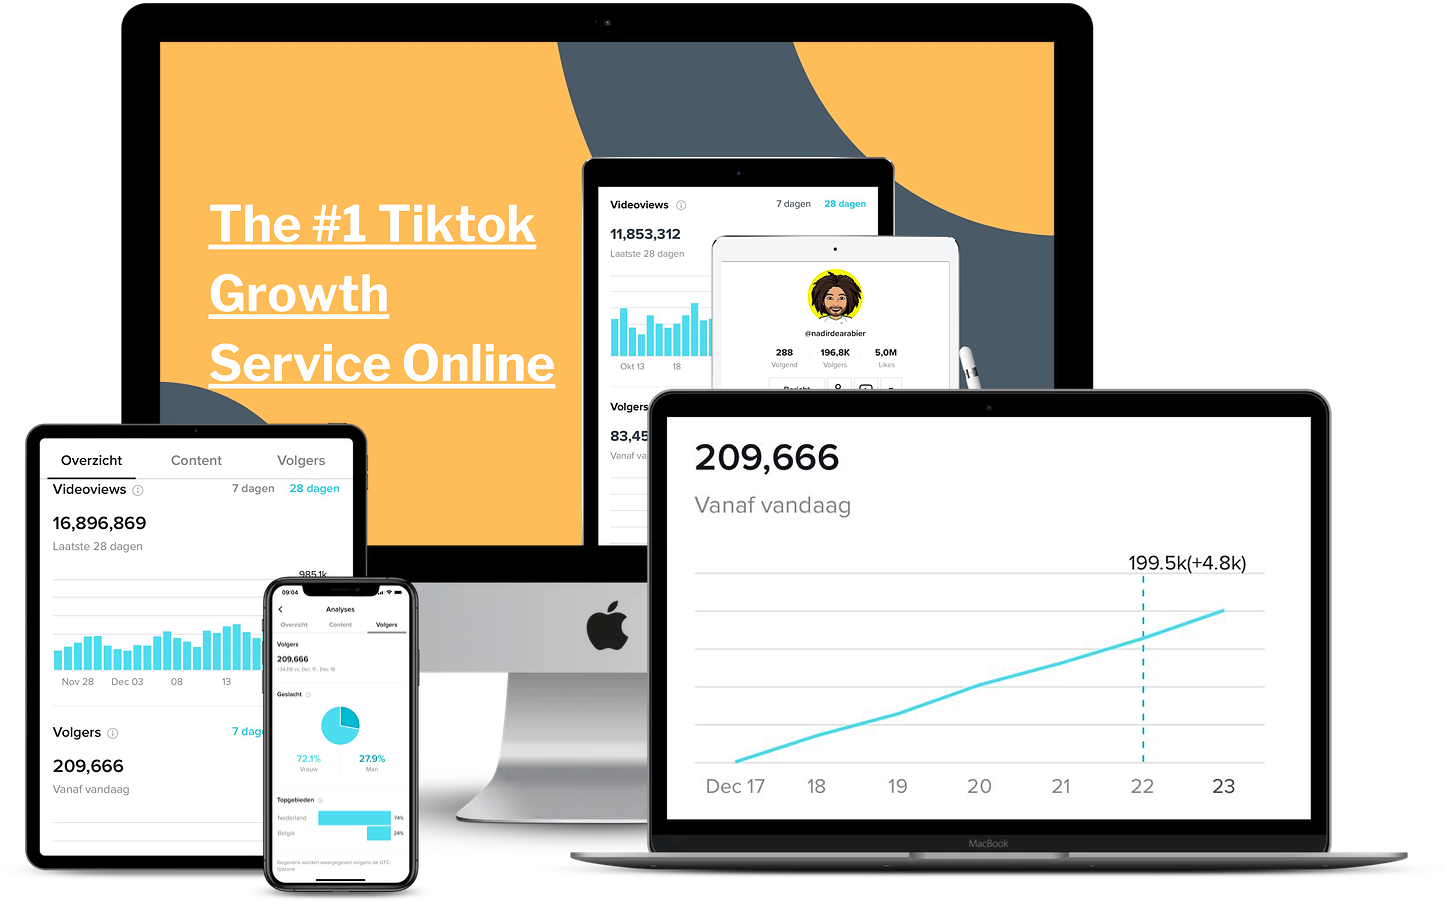 Tiktok Growth Service